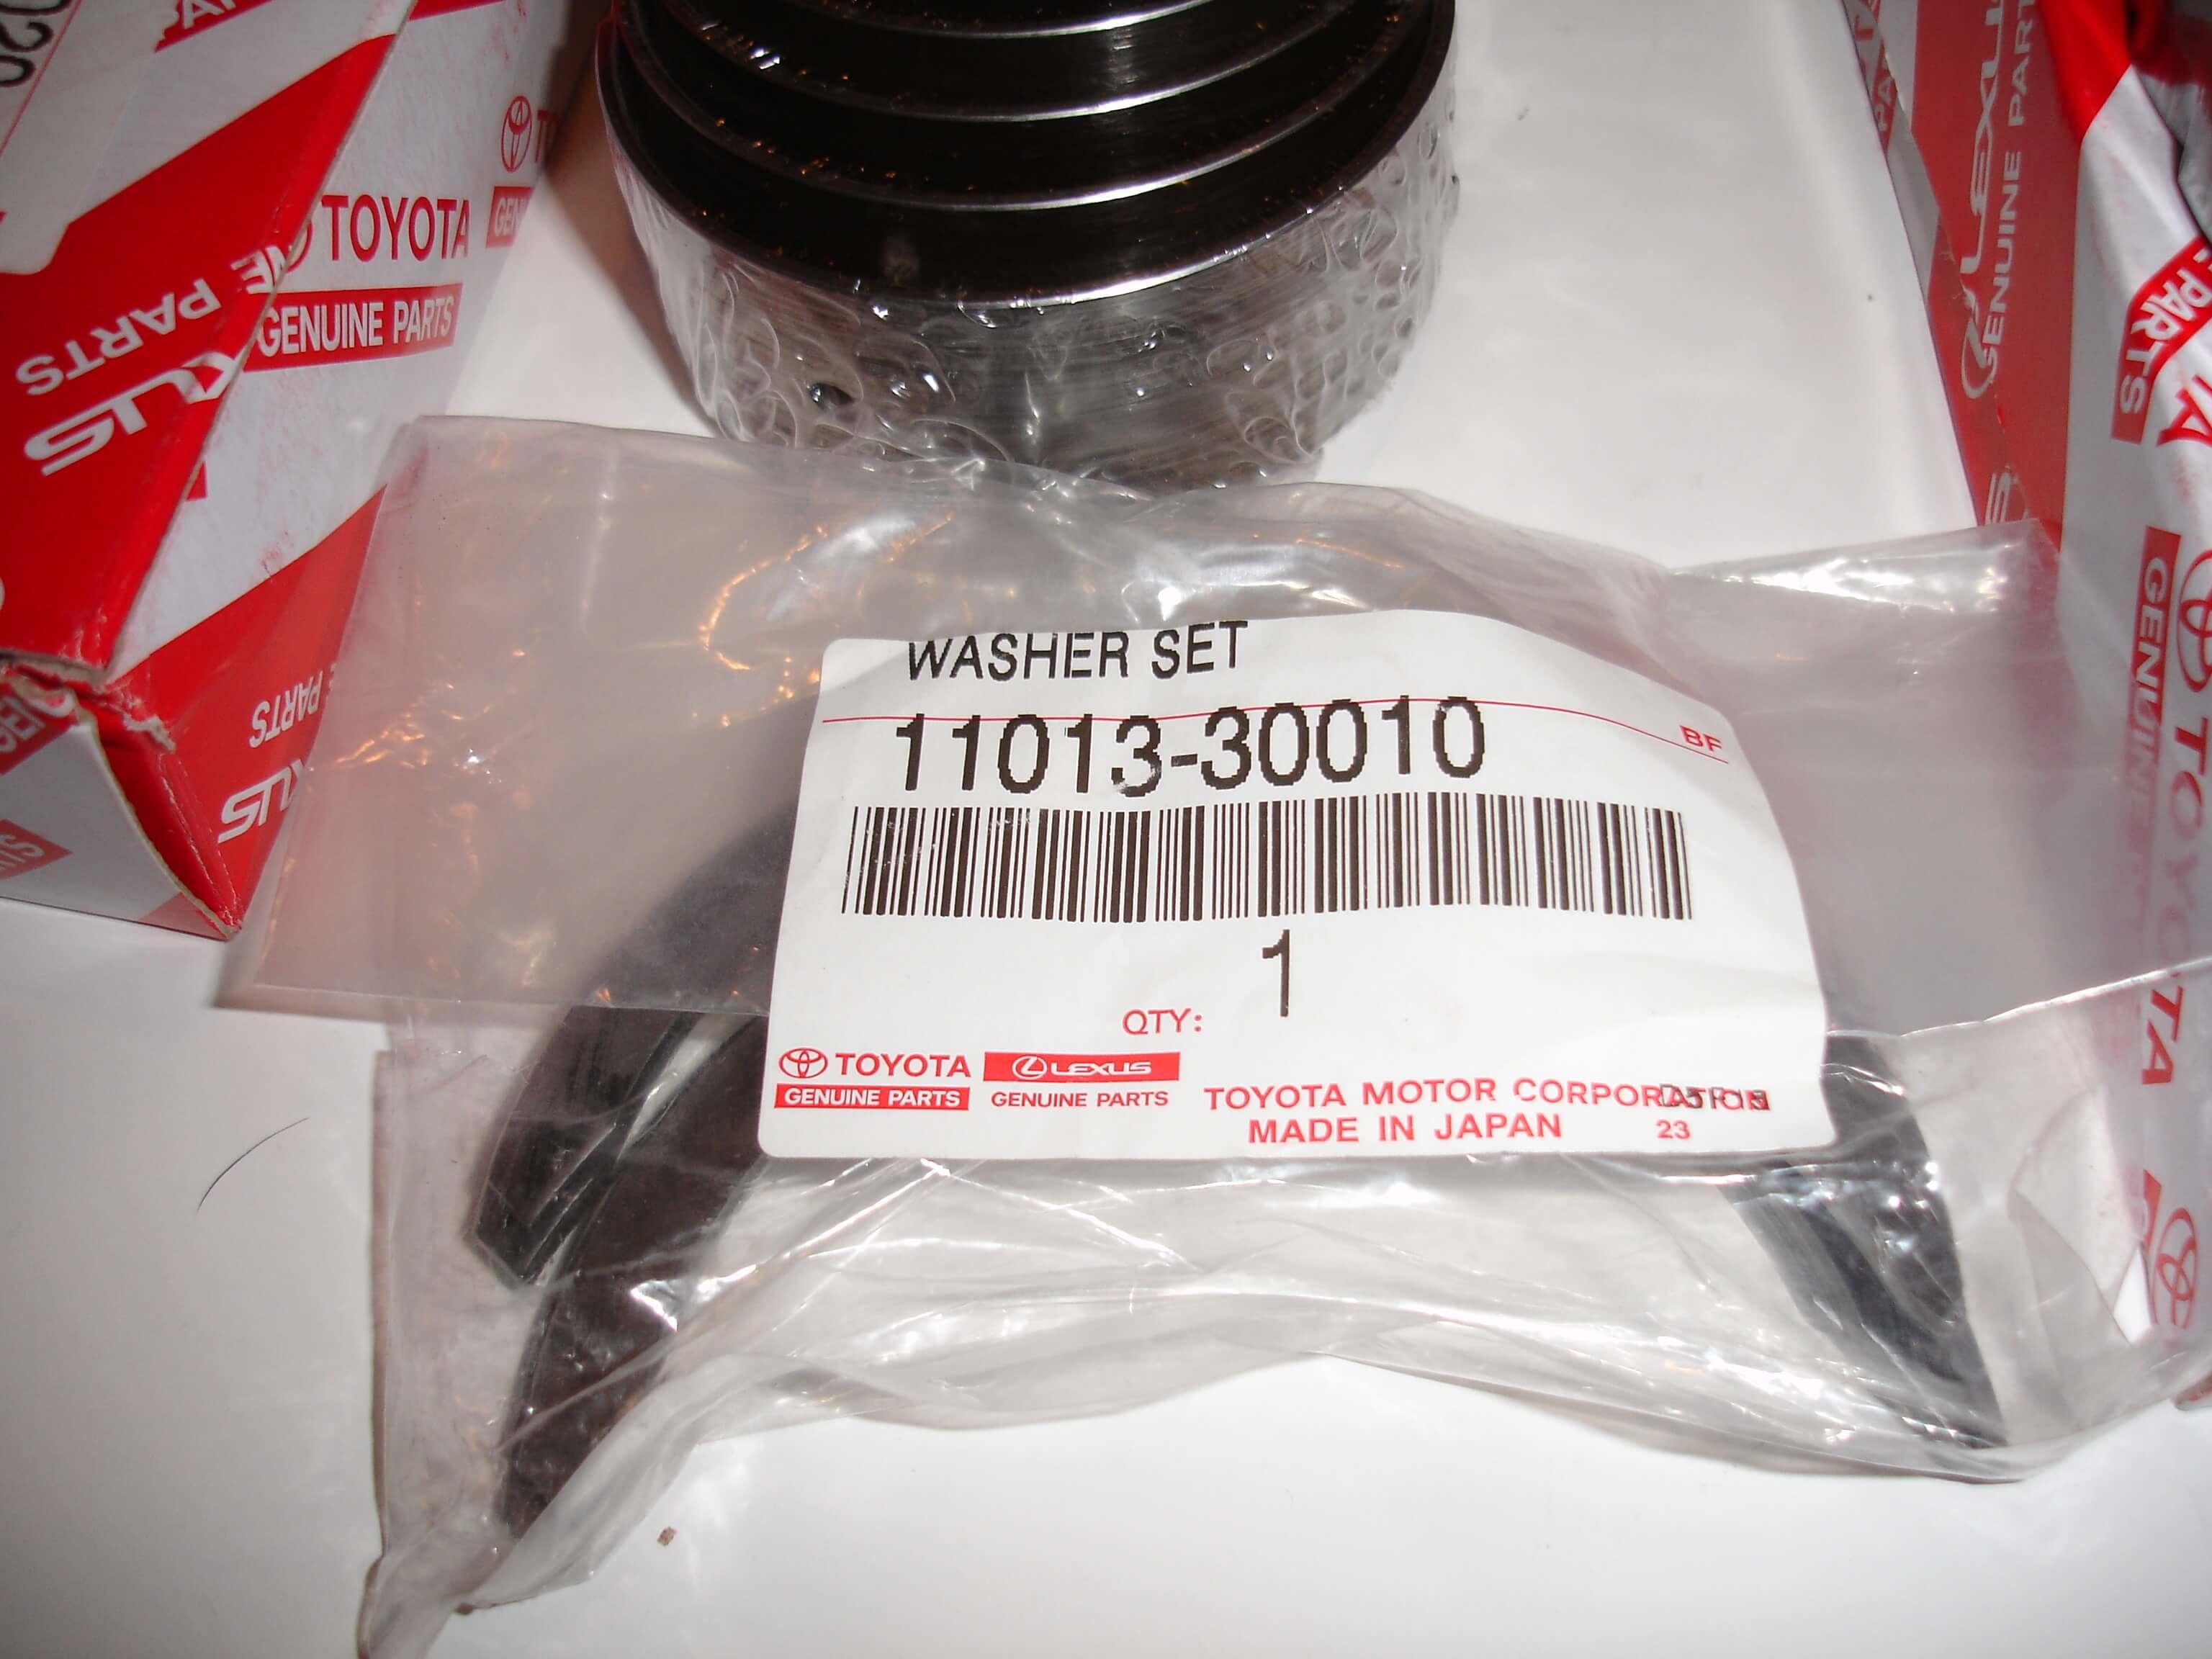 Toyota-OEM-Genuine-1KZ-1KD-2KD-Rod-Main-Thrust-Bearings-U-S-0-25-O-S-25 Toyota-OEM-Genuine-1KZ-1KD-2KD-Rod-Main-Thrust-Bearings-U-S-0-25-O-S-25 Toyota-OEM-Genuine-1KZ-1KD-2KD-Rod-Main-Thrust-Bearings-U-S-0-25-O-S-25 Toyota-OEM-Genuine-1KZ-1KD-2KD-Rod-Main-Thrust-Bearings-U-S-0-25-O-S-25 Have one to sell? Sell now Toyota OEM Genuine 1KZ 1KD 2KD Rod Main Thrust Bearings U/S 0.25 O/S .25